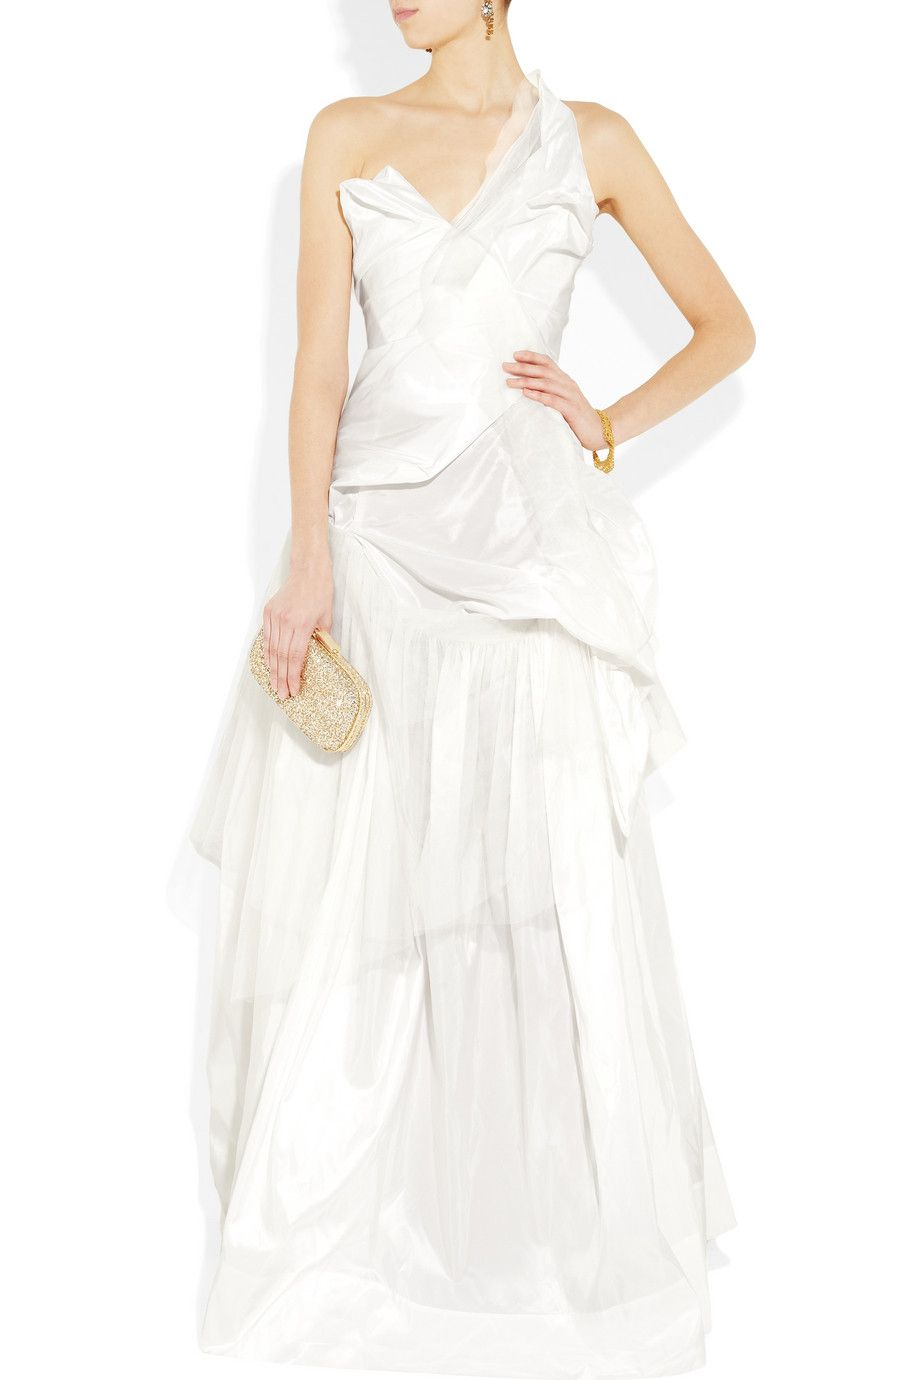 Vivienne Westwood Gold Label Bronze Silk Taffeta And Tulle Dress 4 590 Vivienne Westwood Wedding Dress Vivienne Westwood Wedding Dresses [ 1380 x 920 Pixel ]